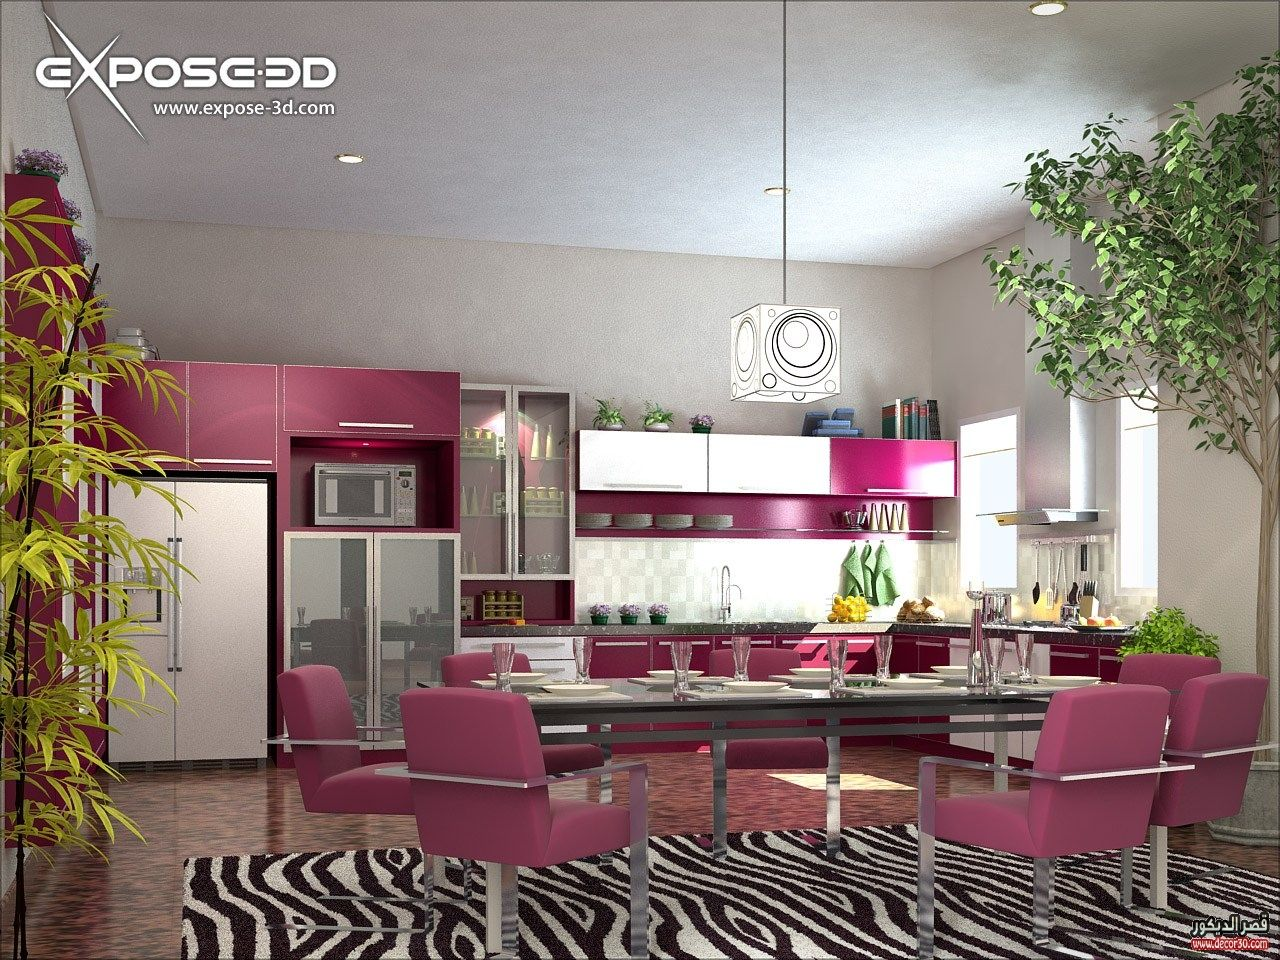 صور مطابخ الوميتال ناعمه Picture Of Alumital Soft Kitchens قصر الديكور Kitchen Design Color House Beautiful Kitchens Kitchen Decor Themes